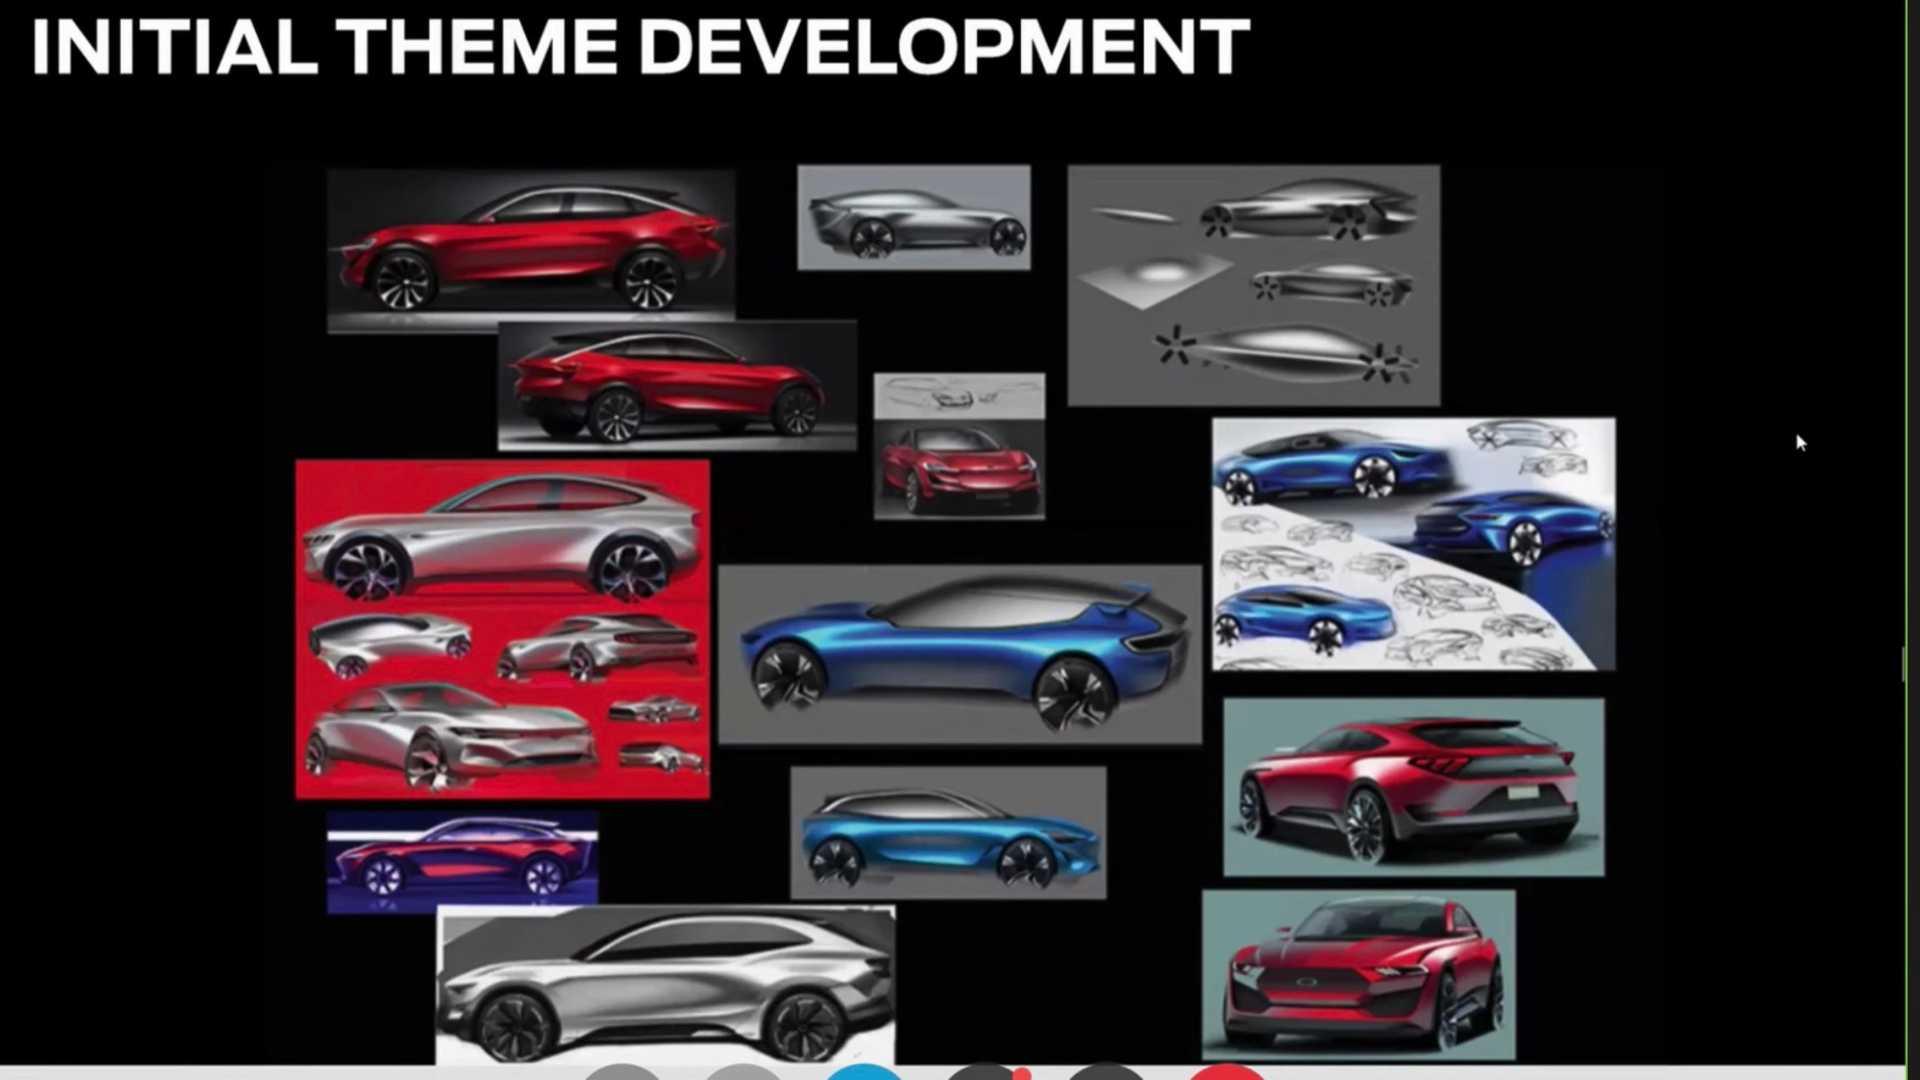 Ford-Mustang-Mach-E-Design-Process-Presentation-7